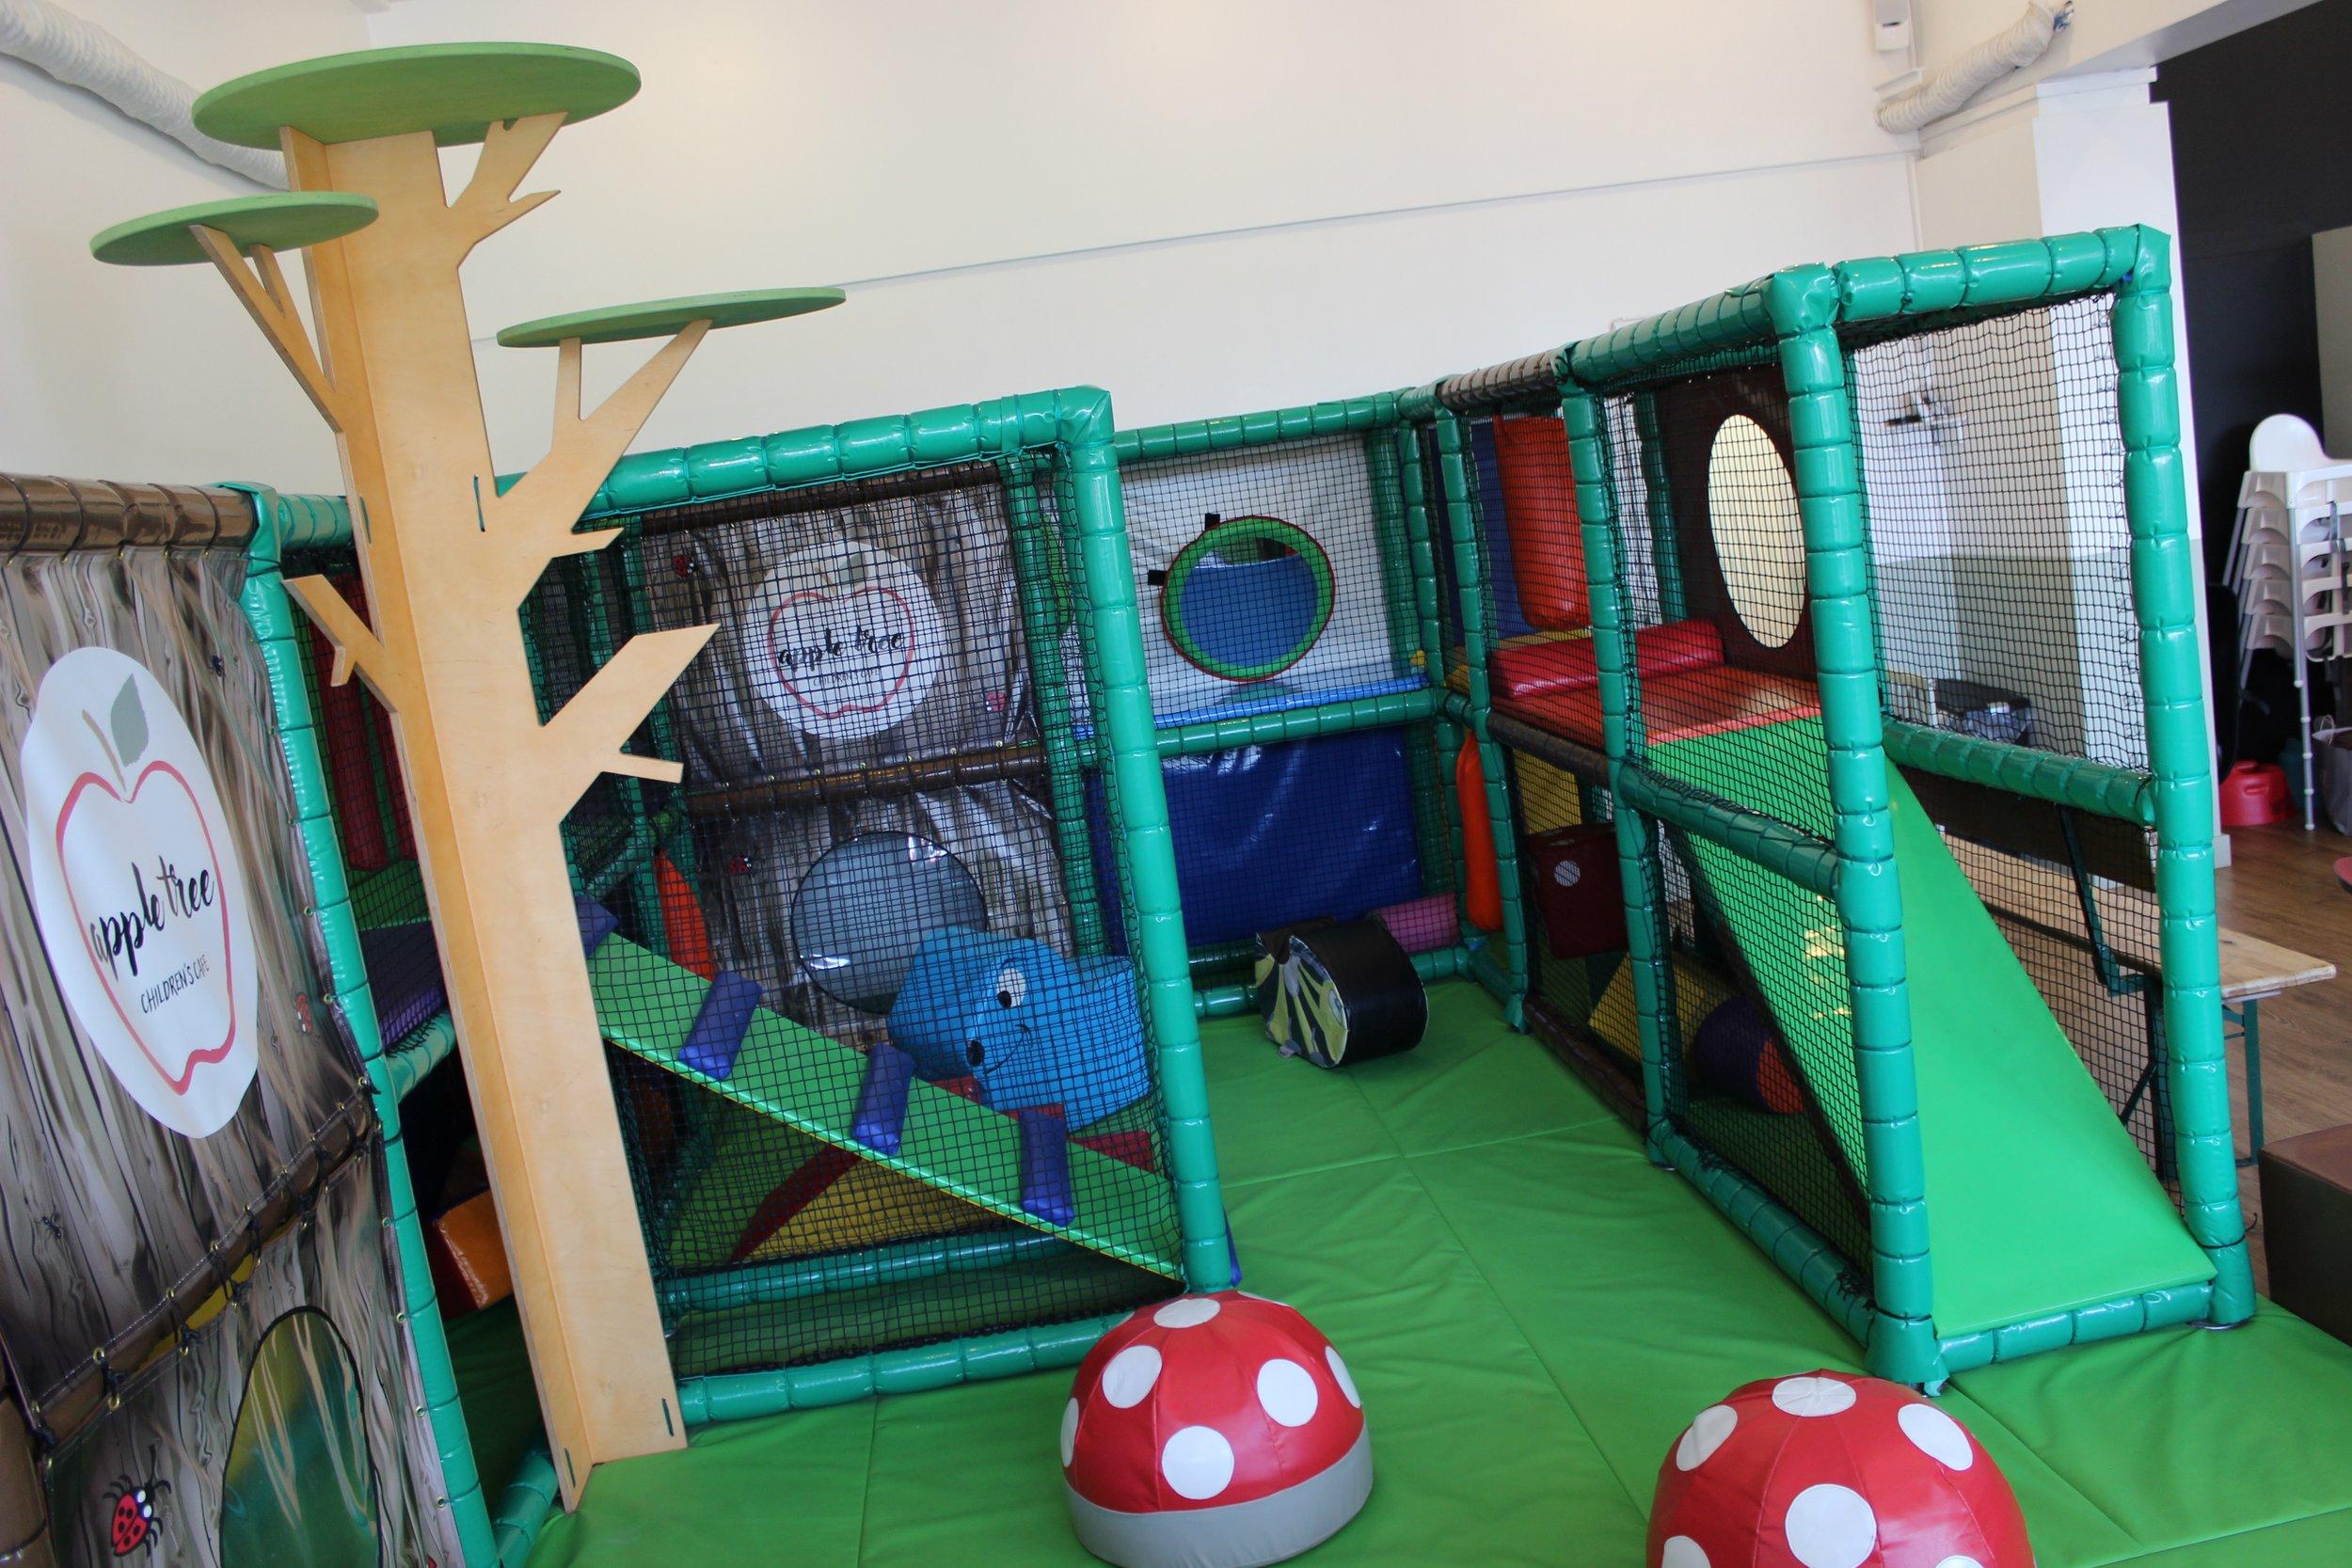 Apple Tree Children's Cafe in Herne Hill South London 16.jpg